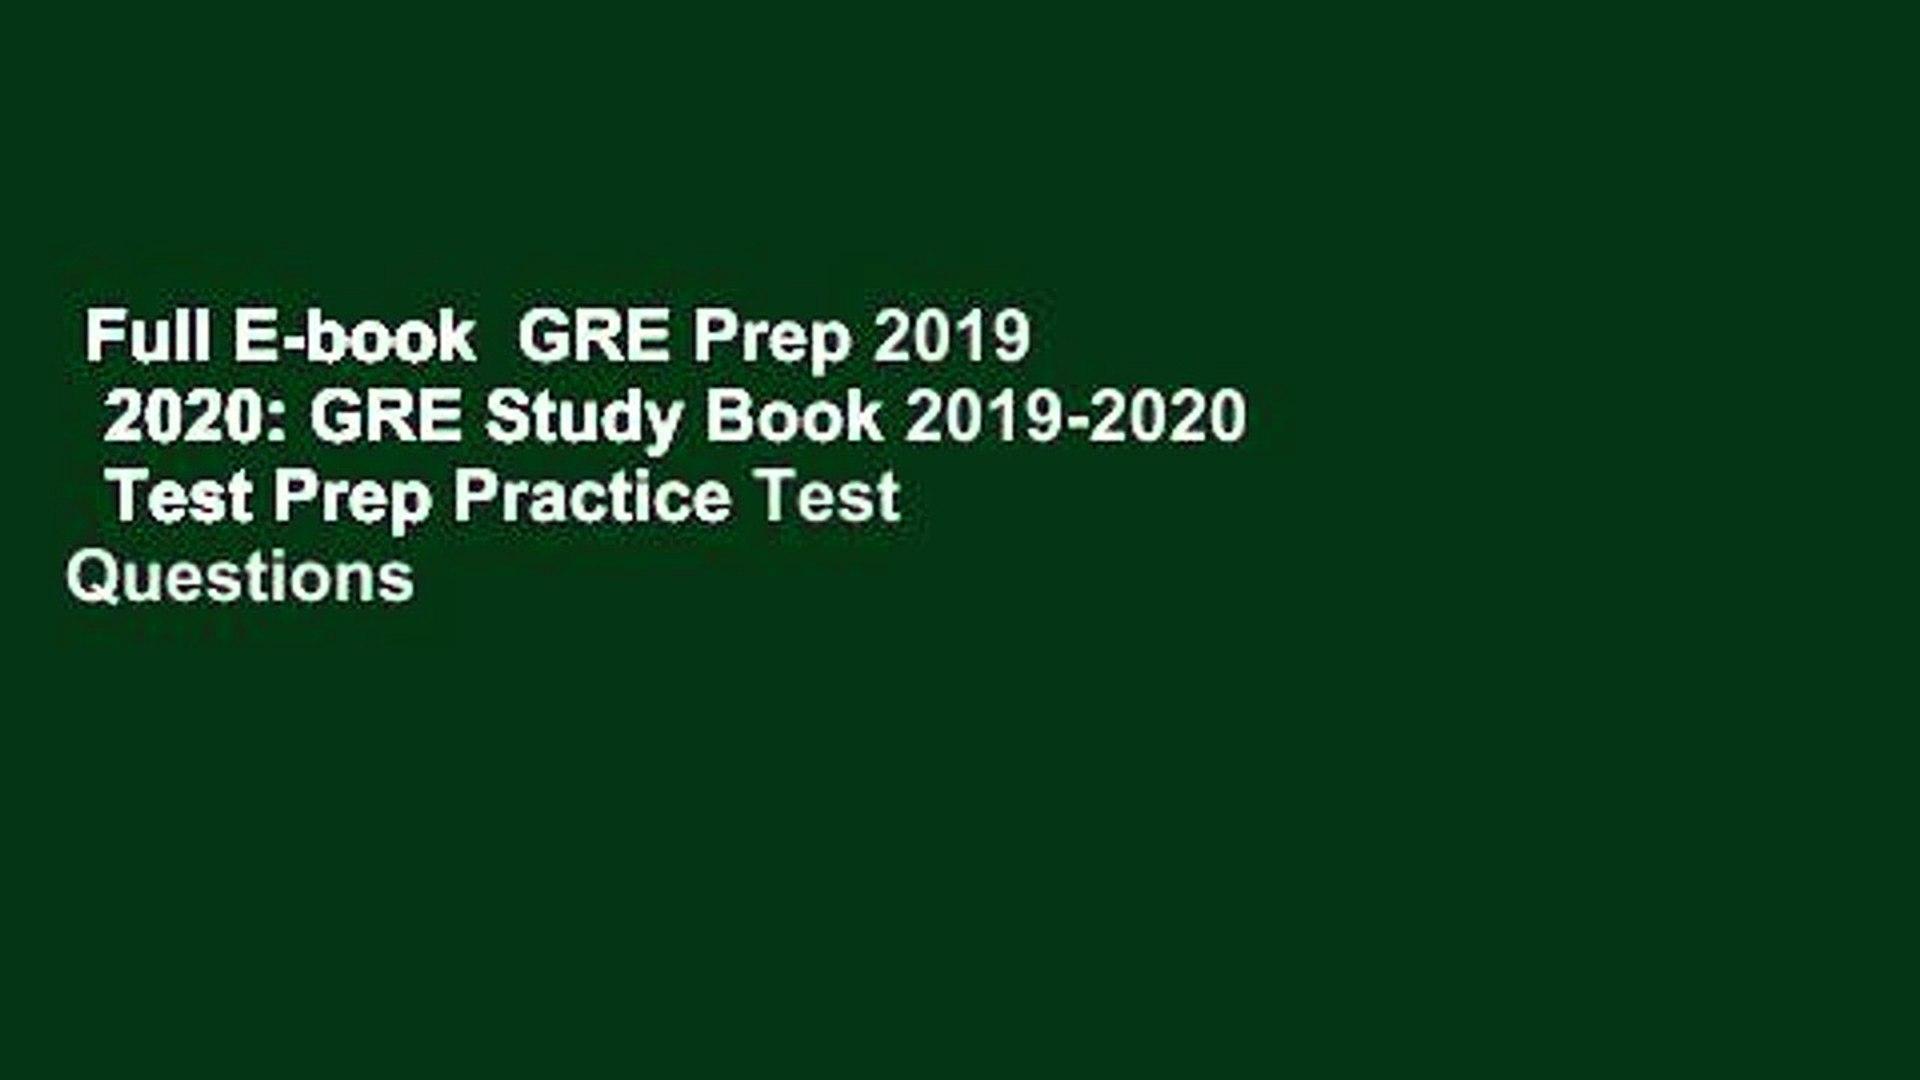 Best Gre Prep Book 2020.Full E Book Gre Prep 2019 2020 Gre Study Book 2019 2020 Test Prep Practice Test Questions